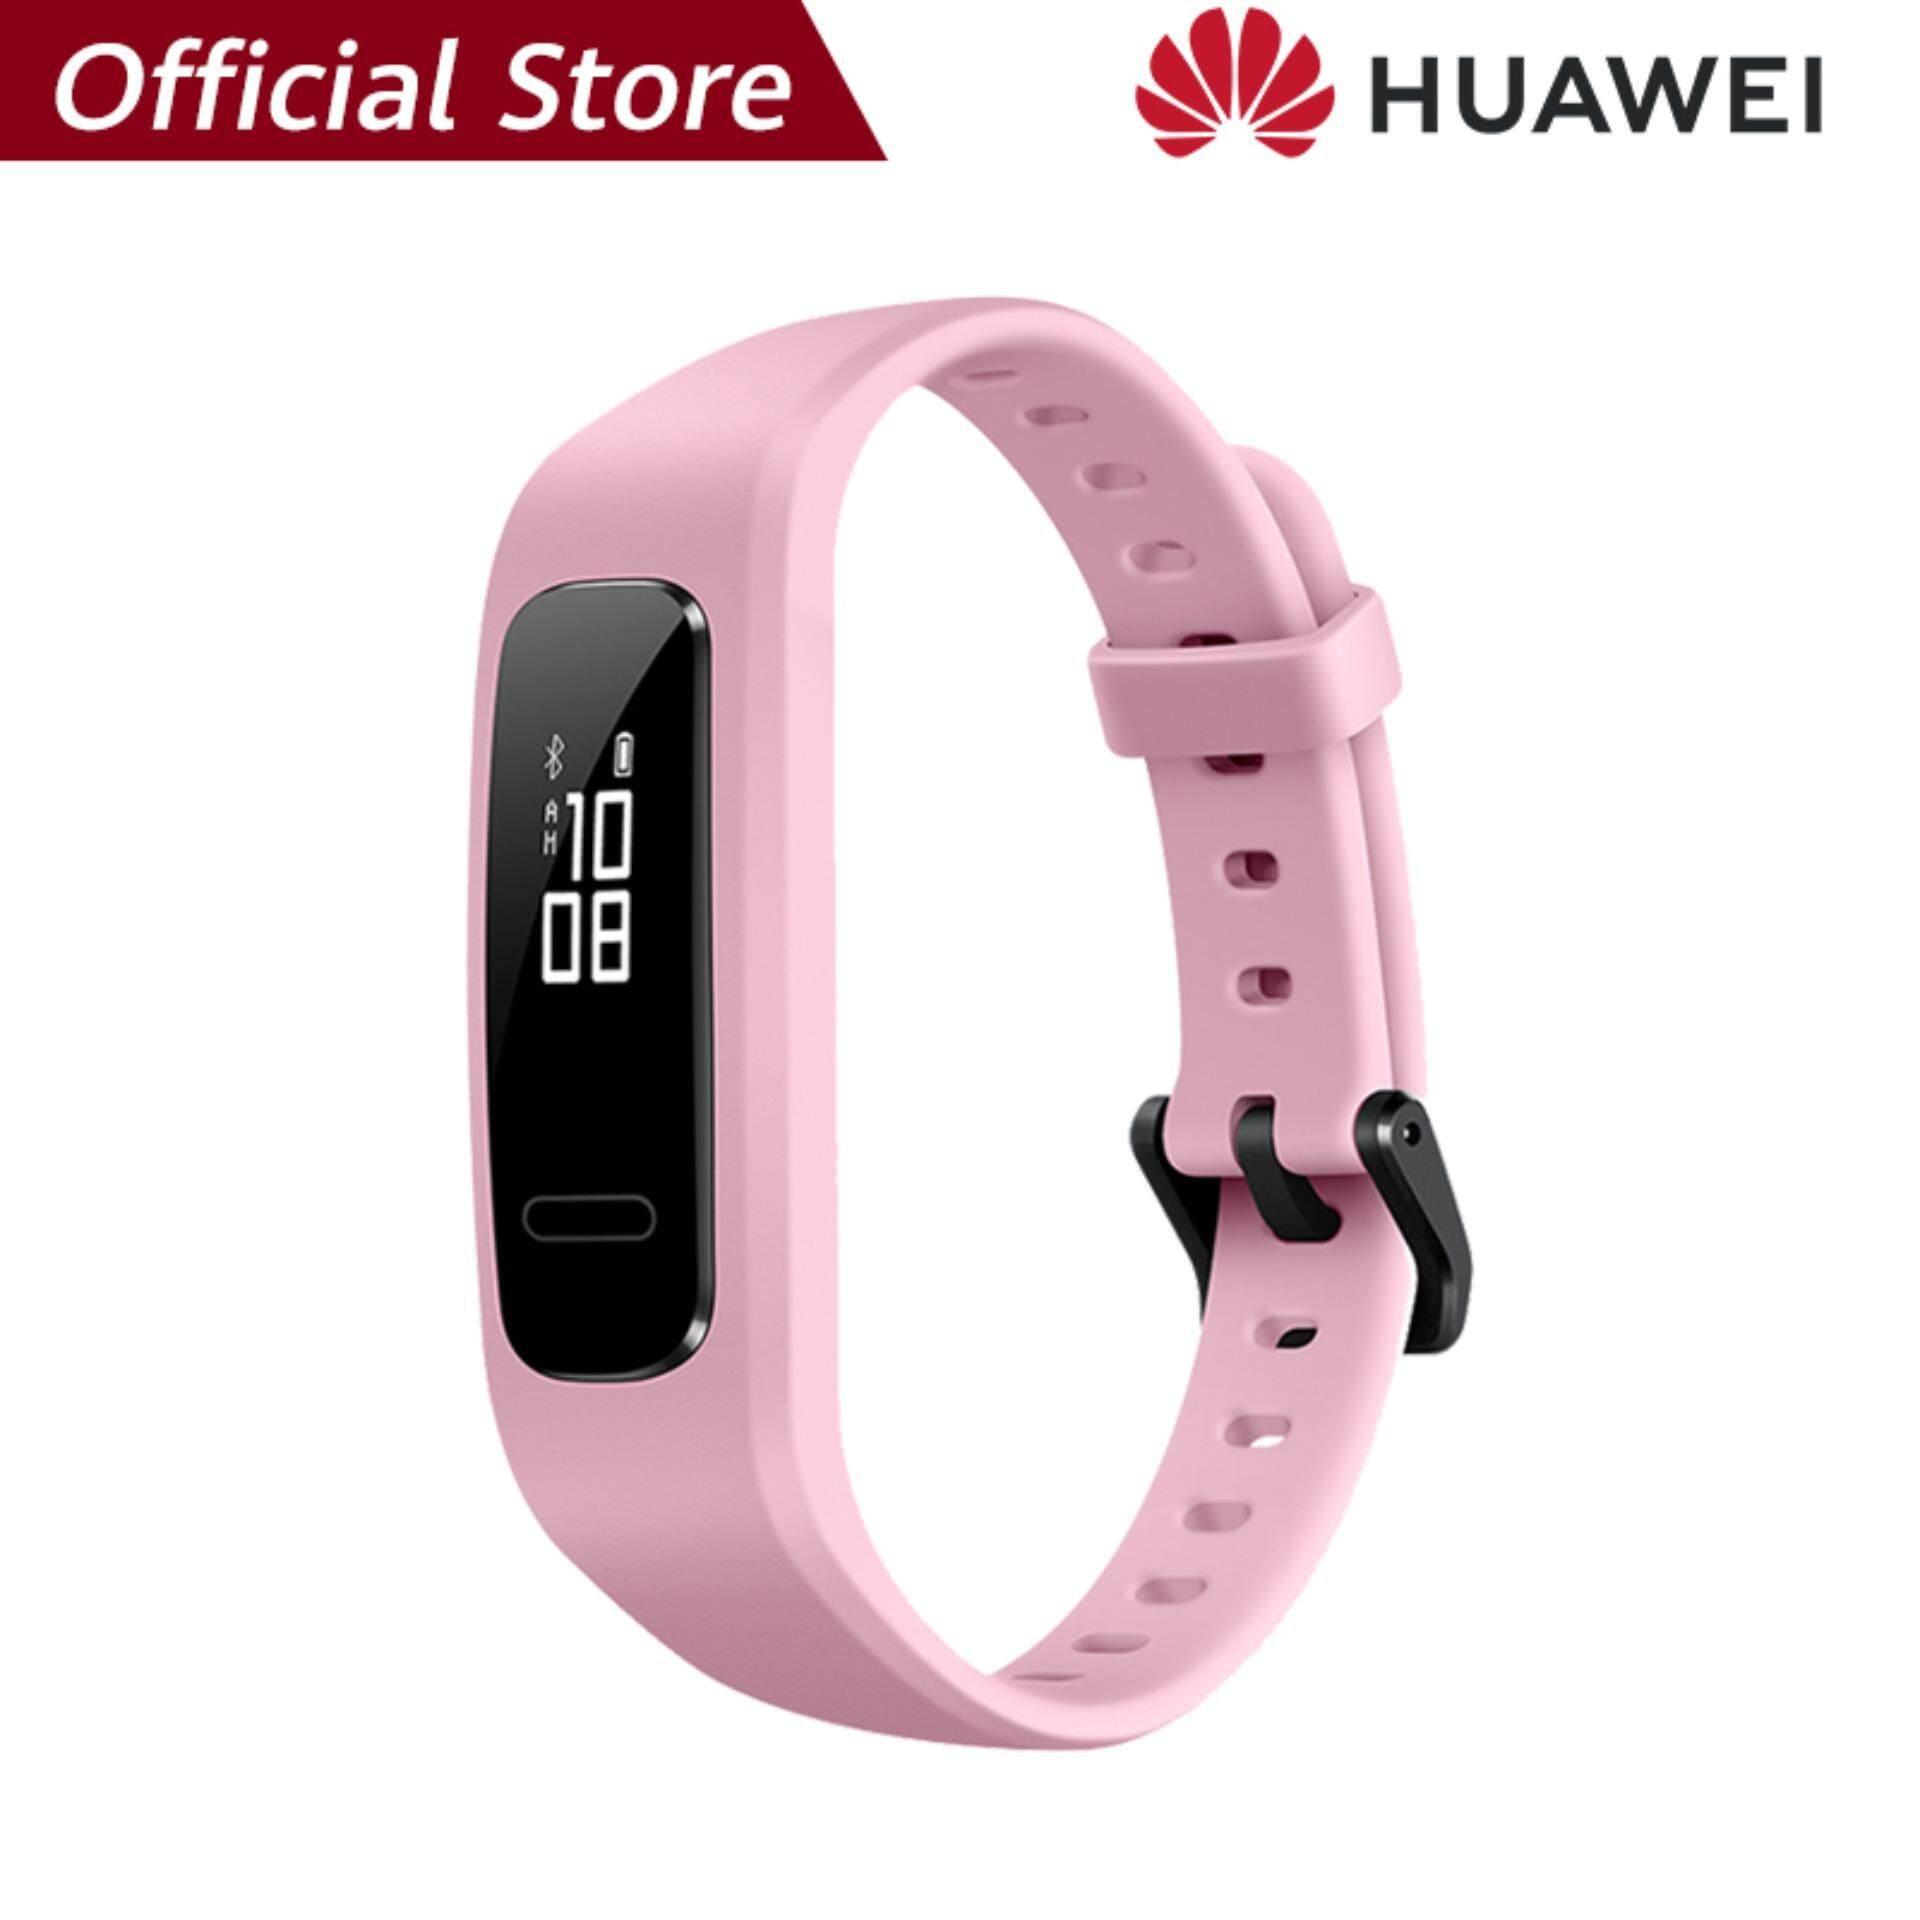 [Special Gifts] Huawei Band 3e*พร้อมของแถมสายรัดนาฬิกา